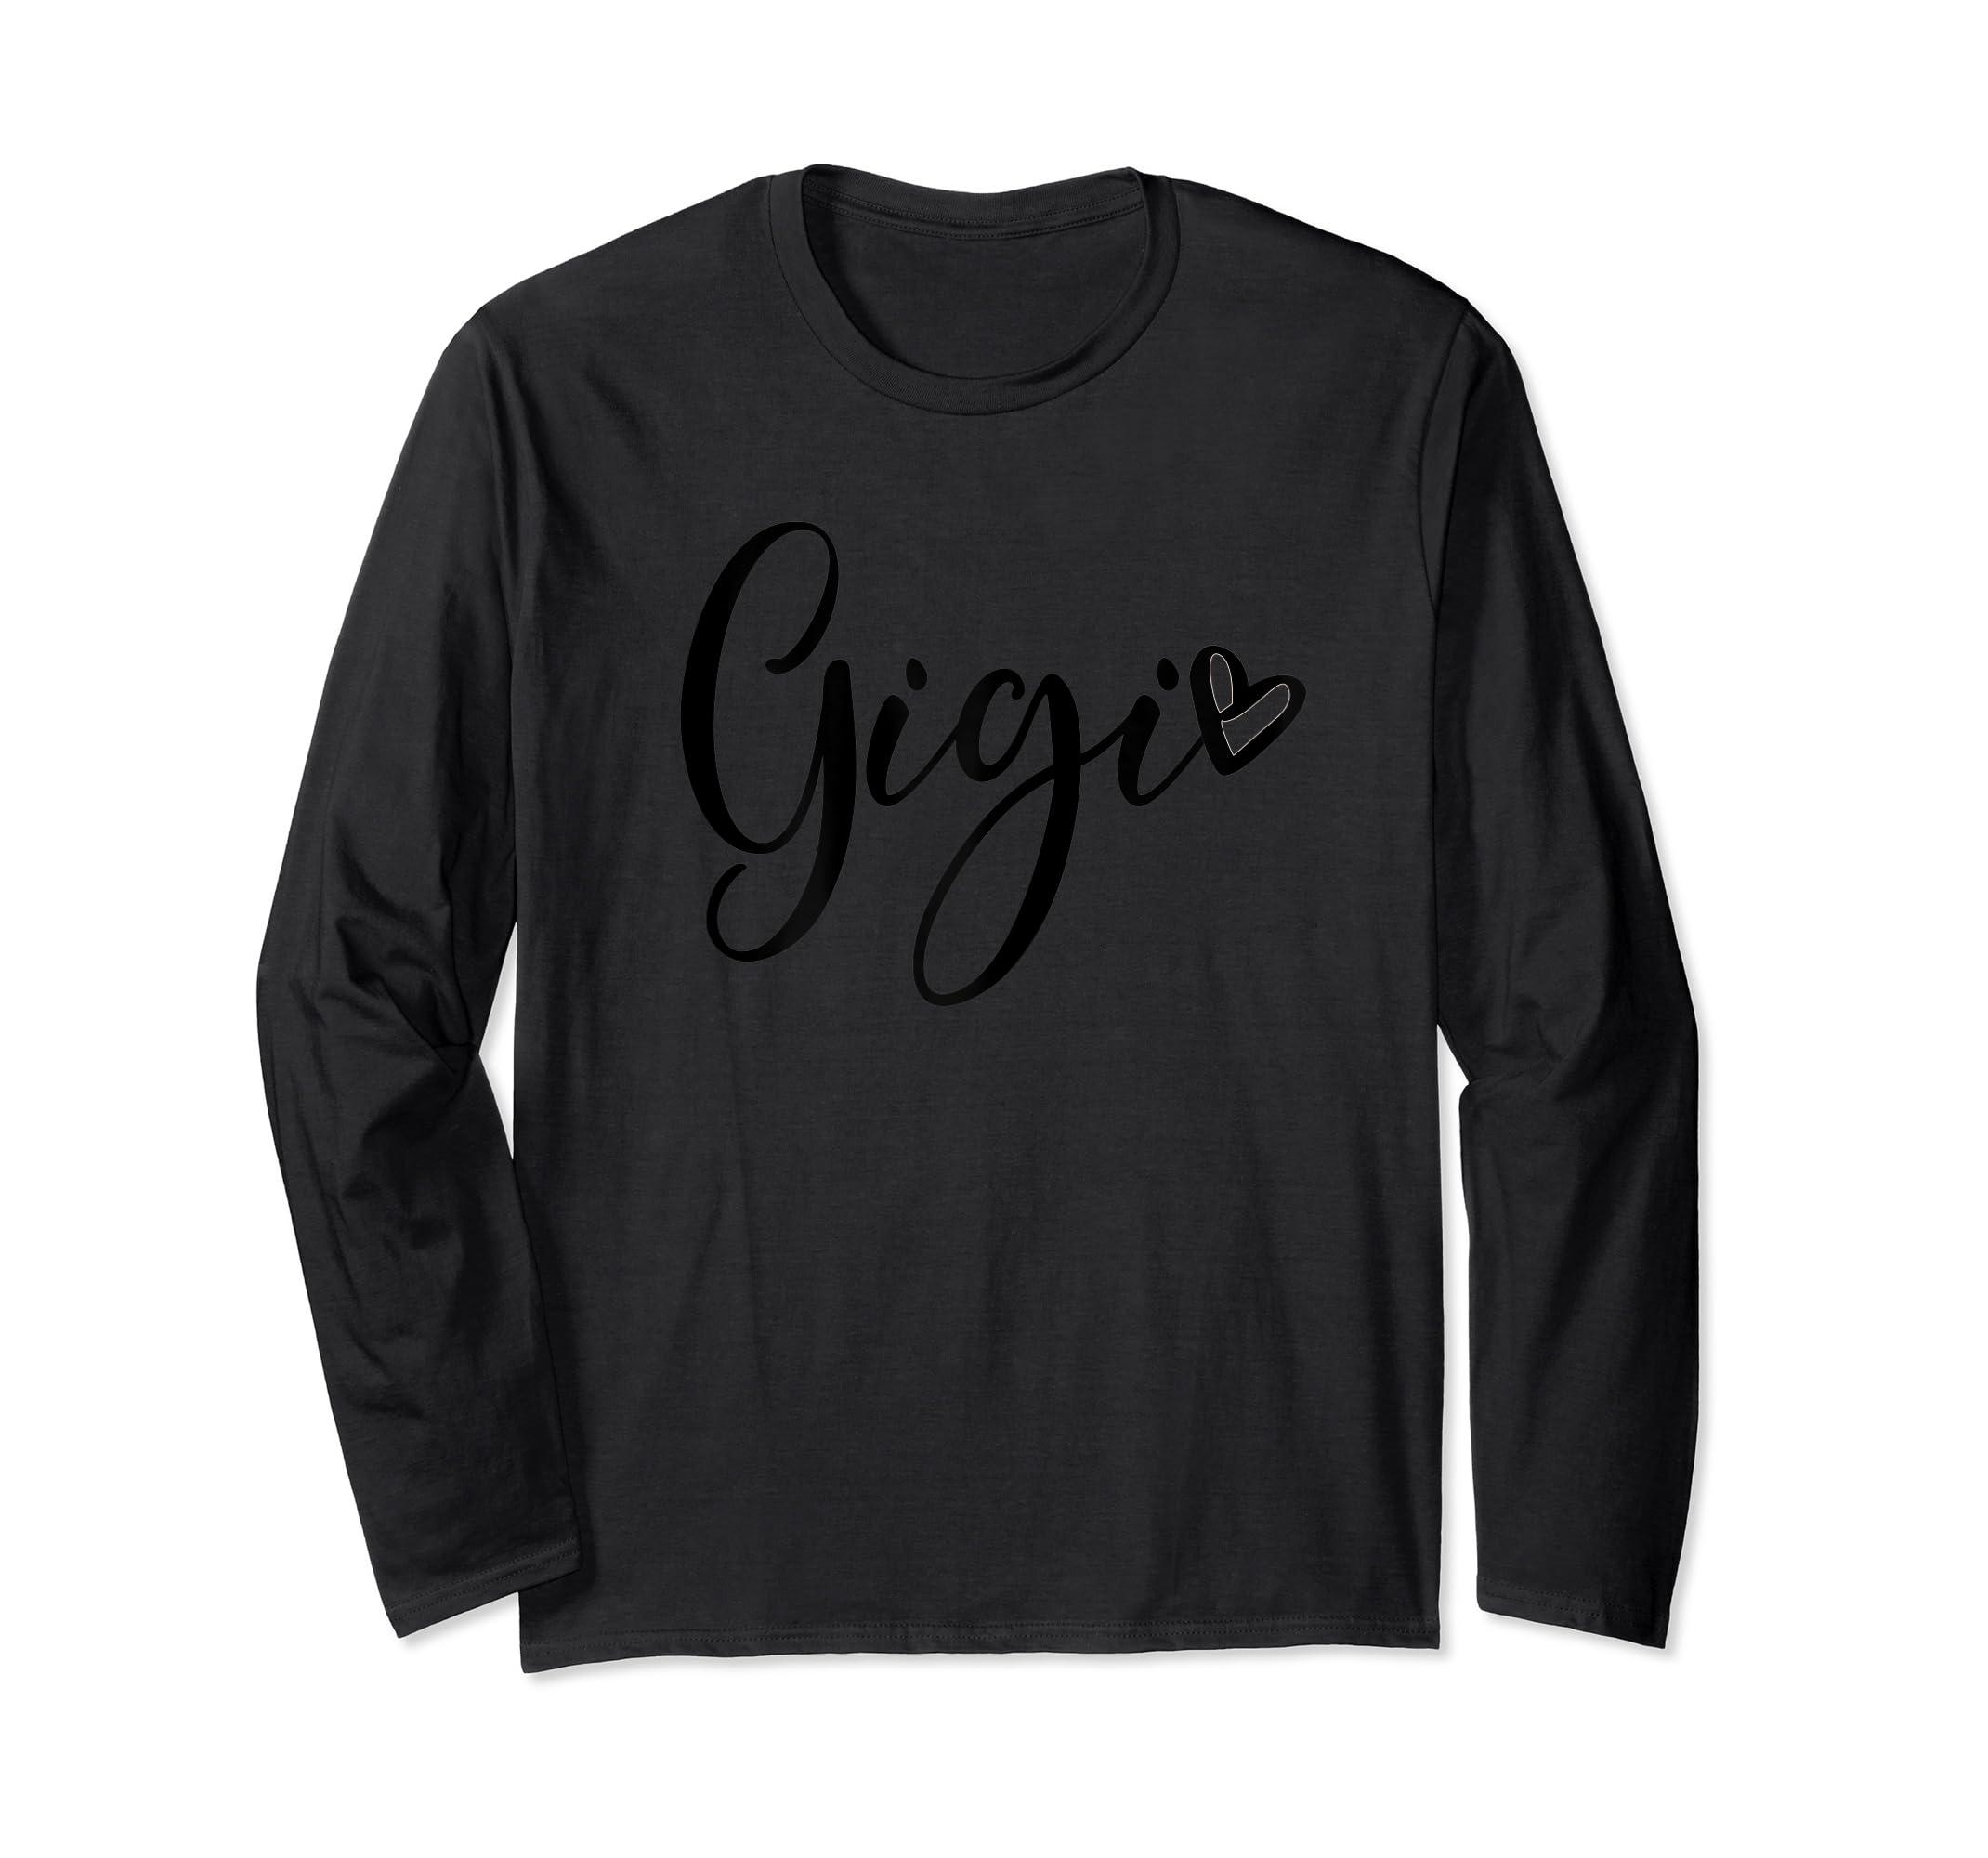 Womens Gigi Grandma T Shirt Pregnancy Announcement Mother's Day-Long Sleeve-Black